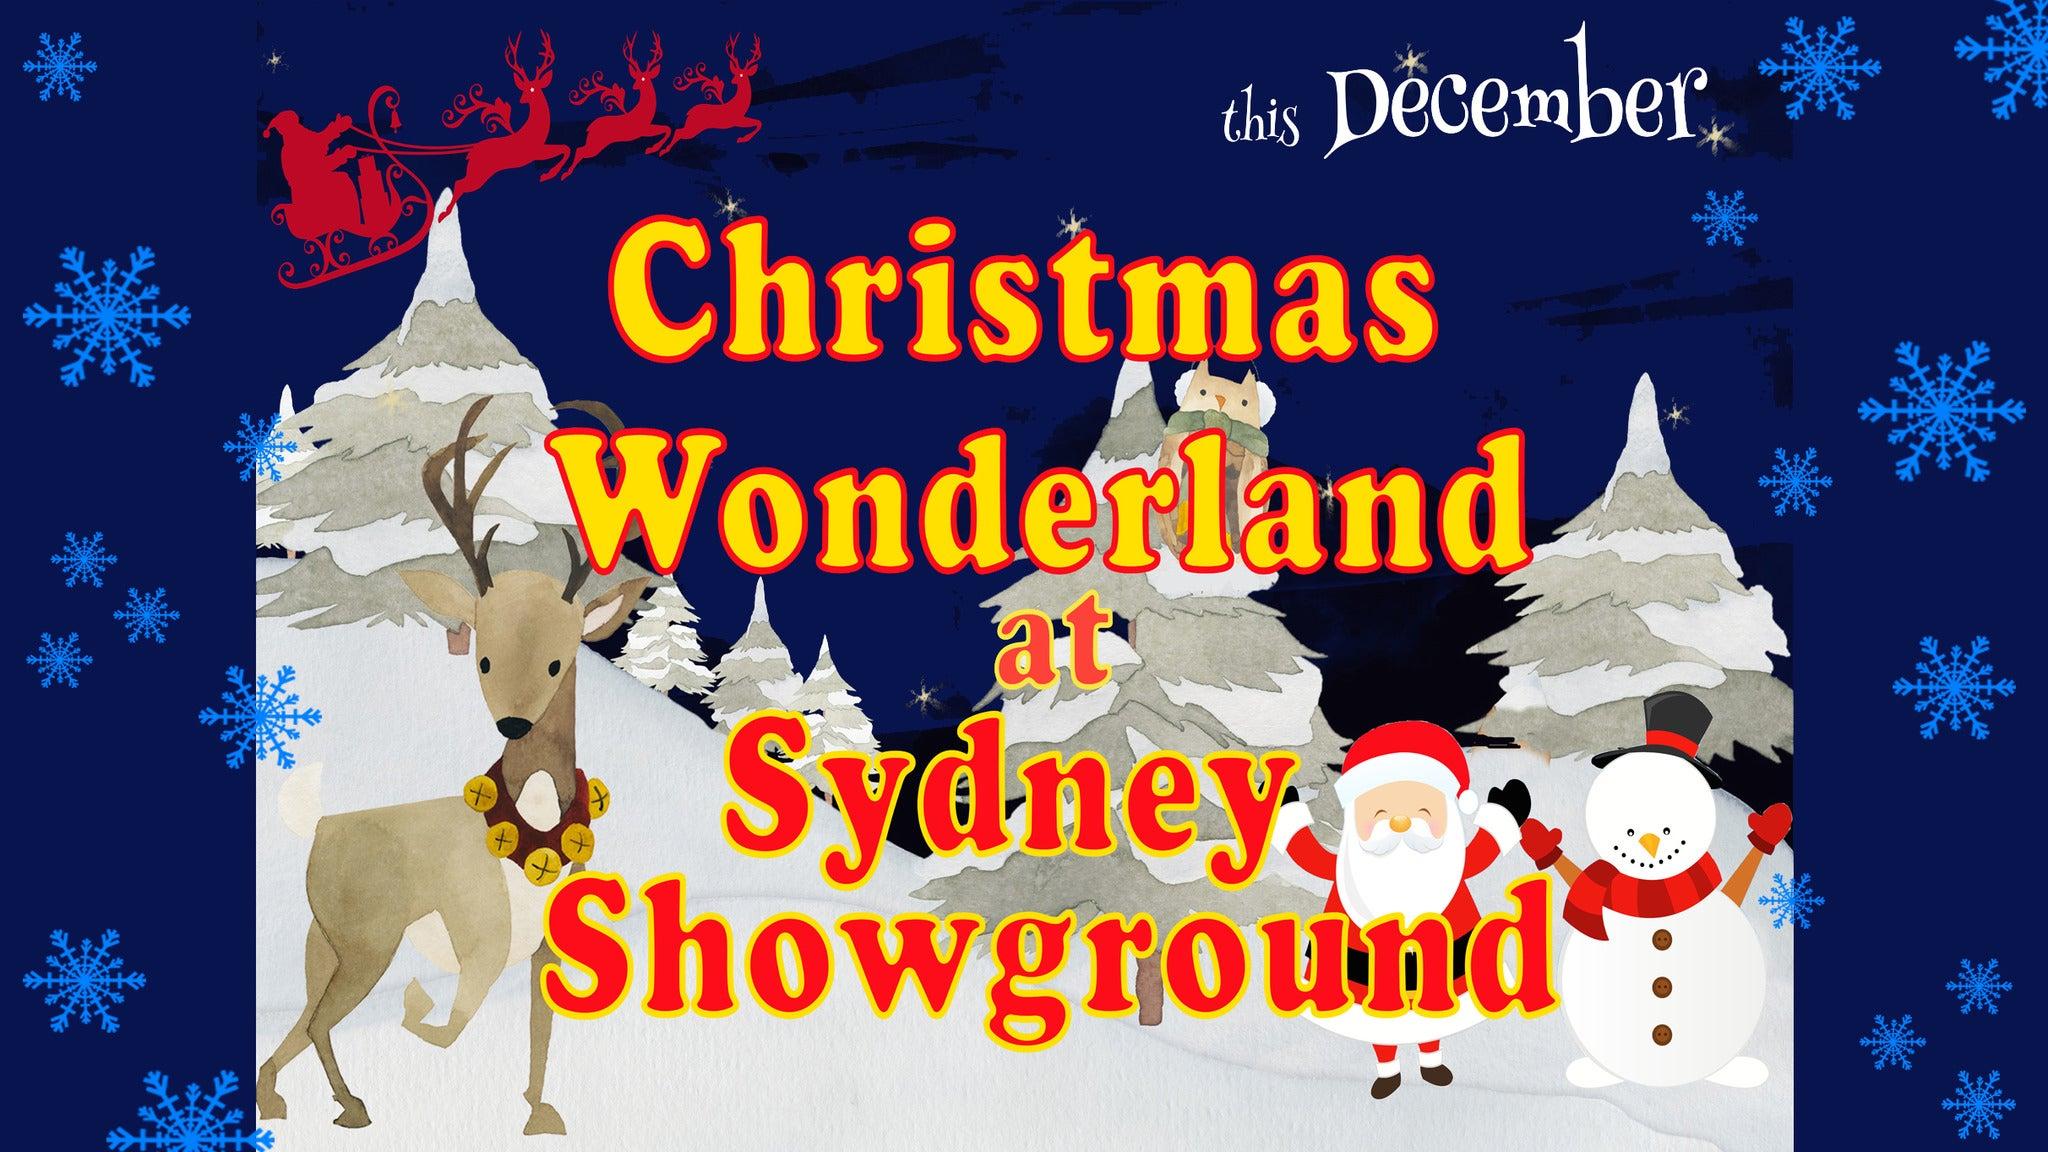 Christmas Wonderland at Macomb Center